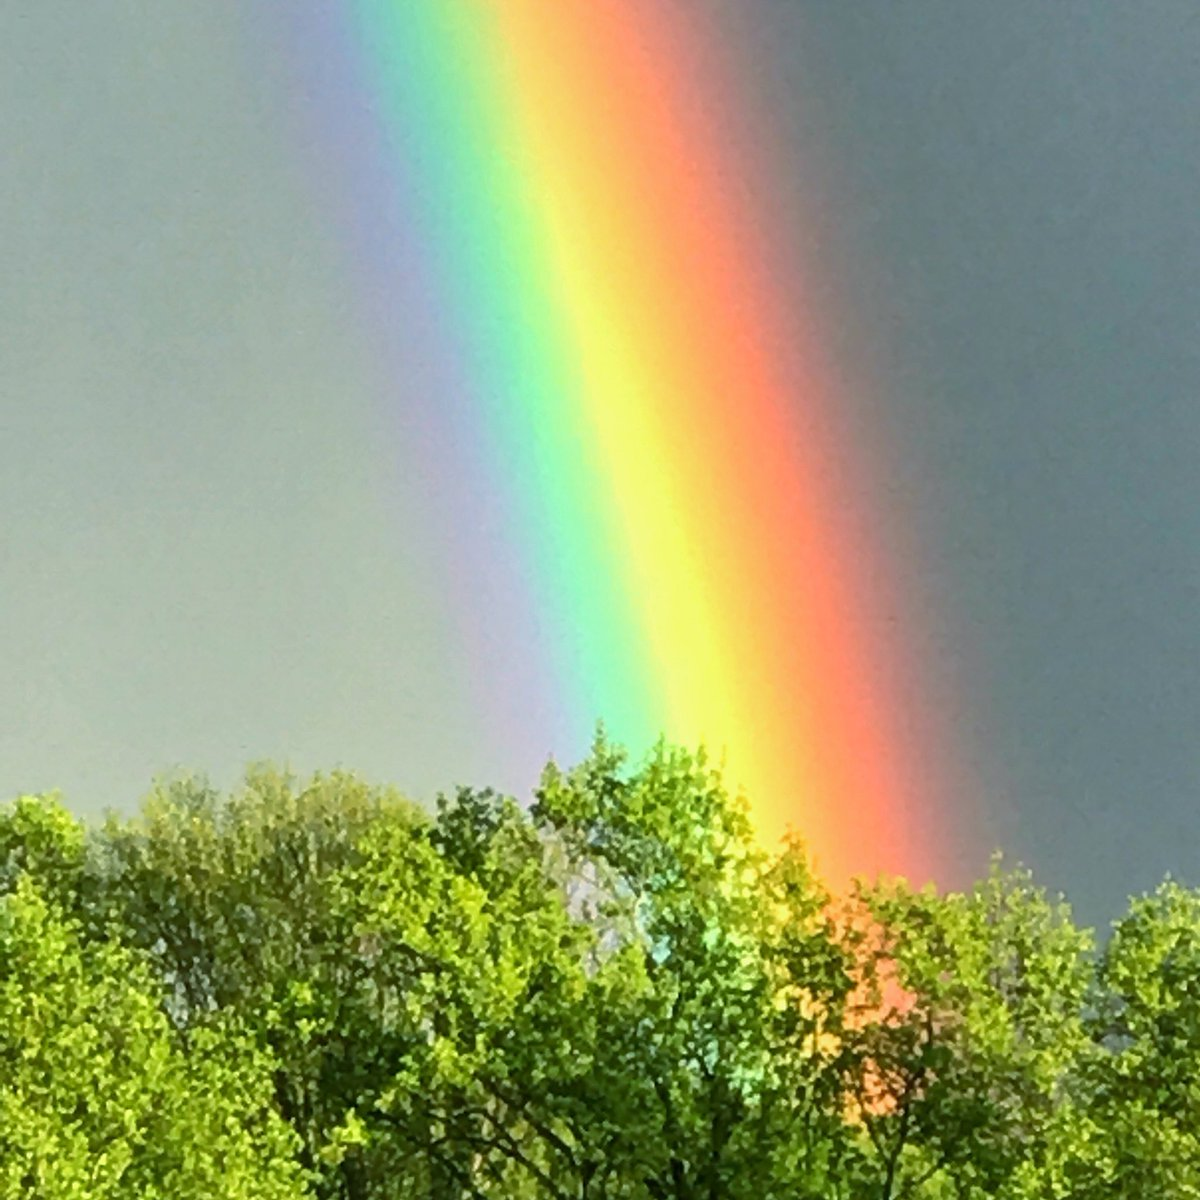 настроение цвета радуги фото израиля